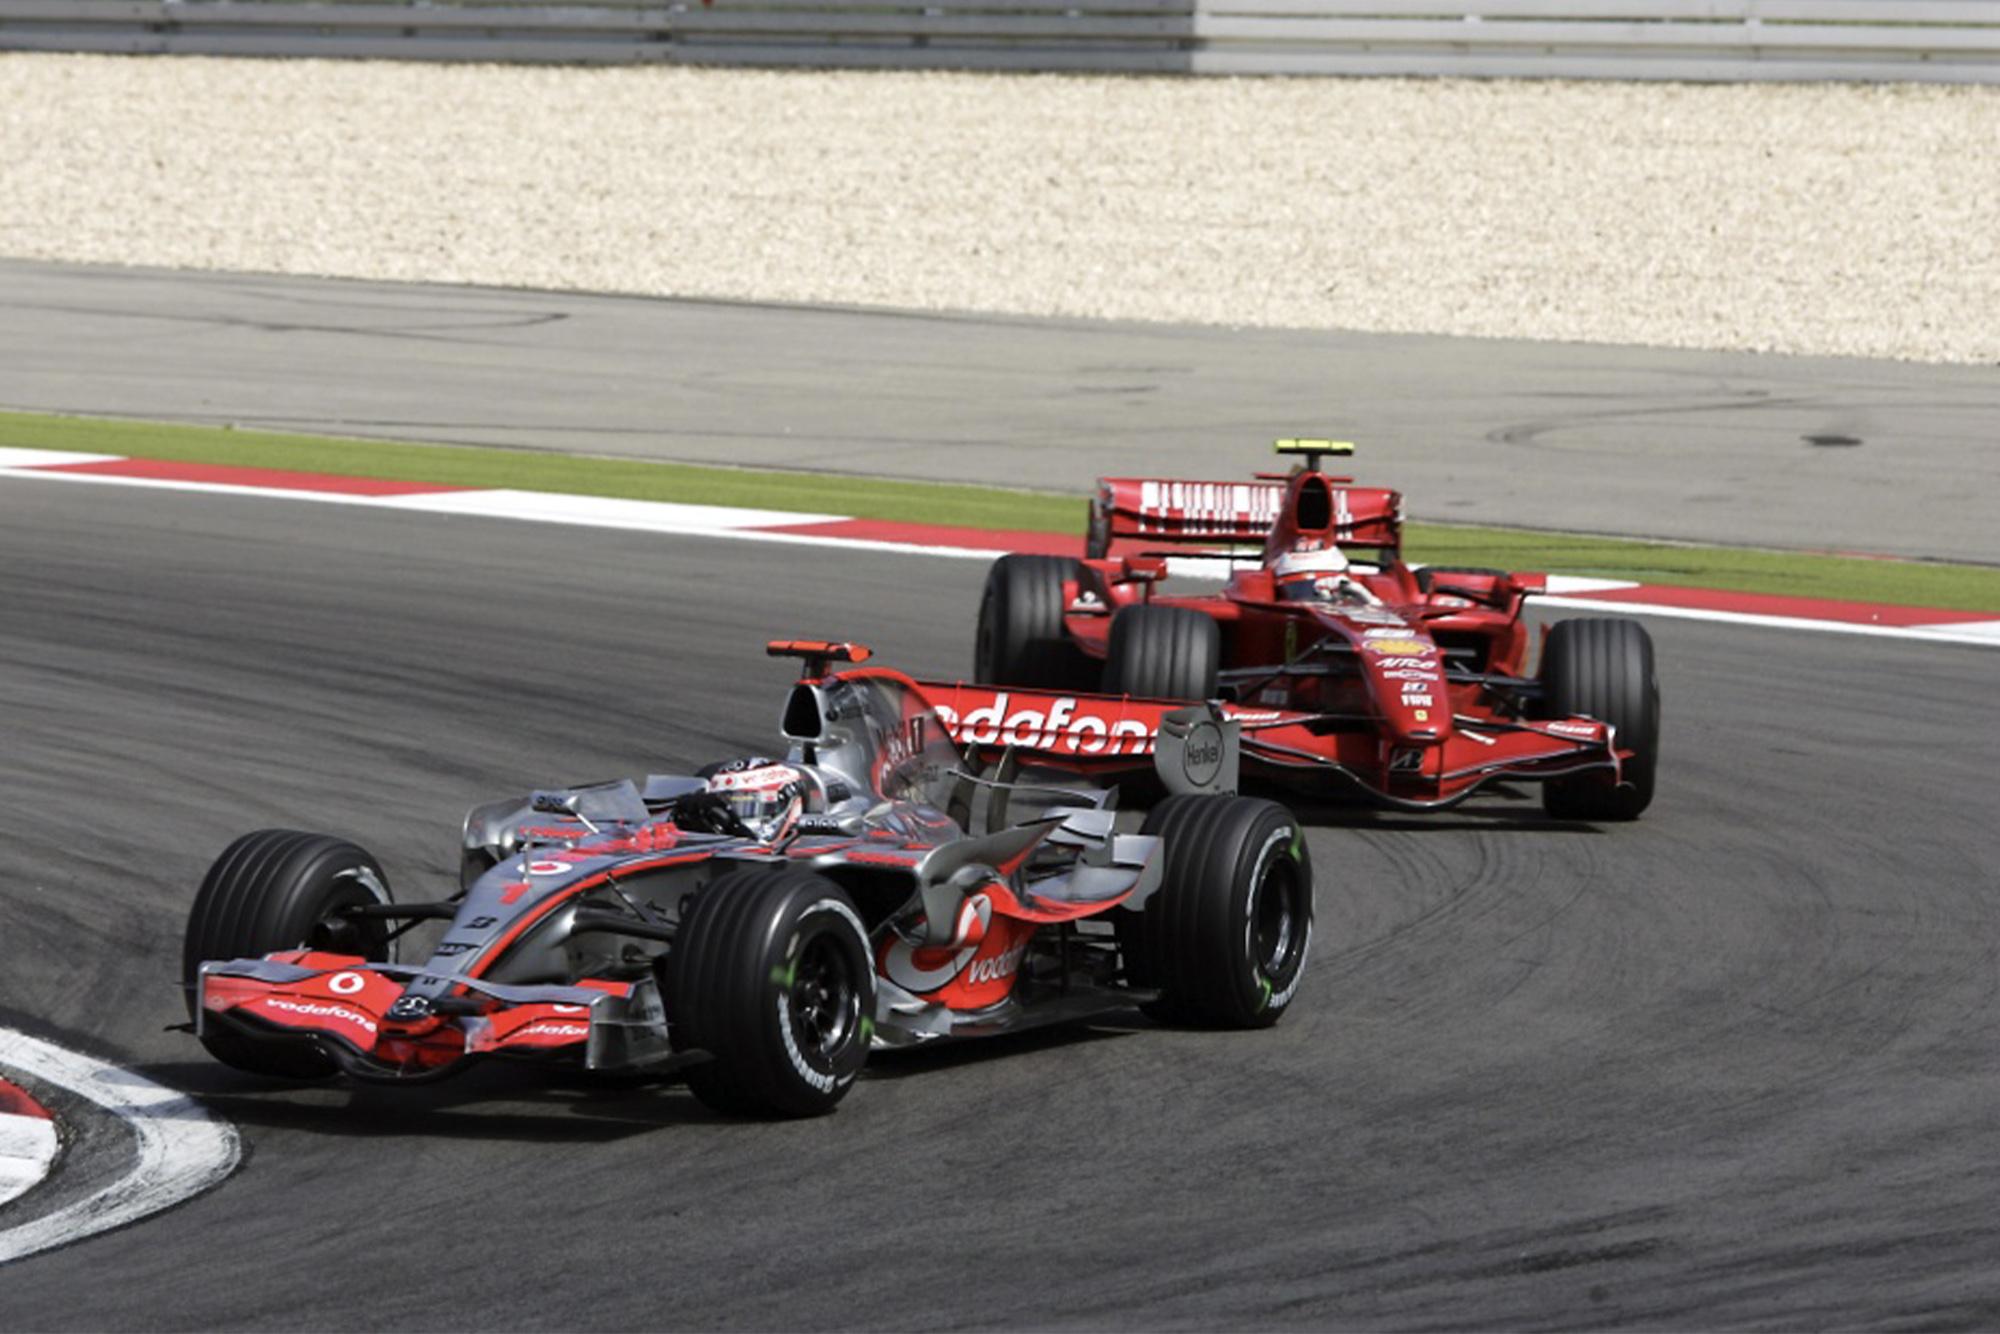 Fernando Alonso in the McLaren and Kimi Raikkonen in the Ferrari during the 2007 German Grand Prix